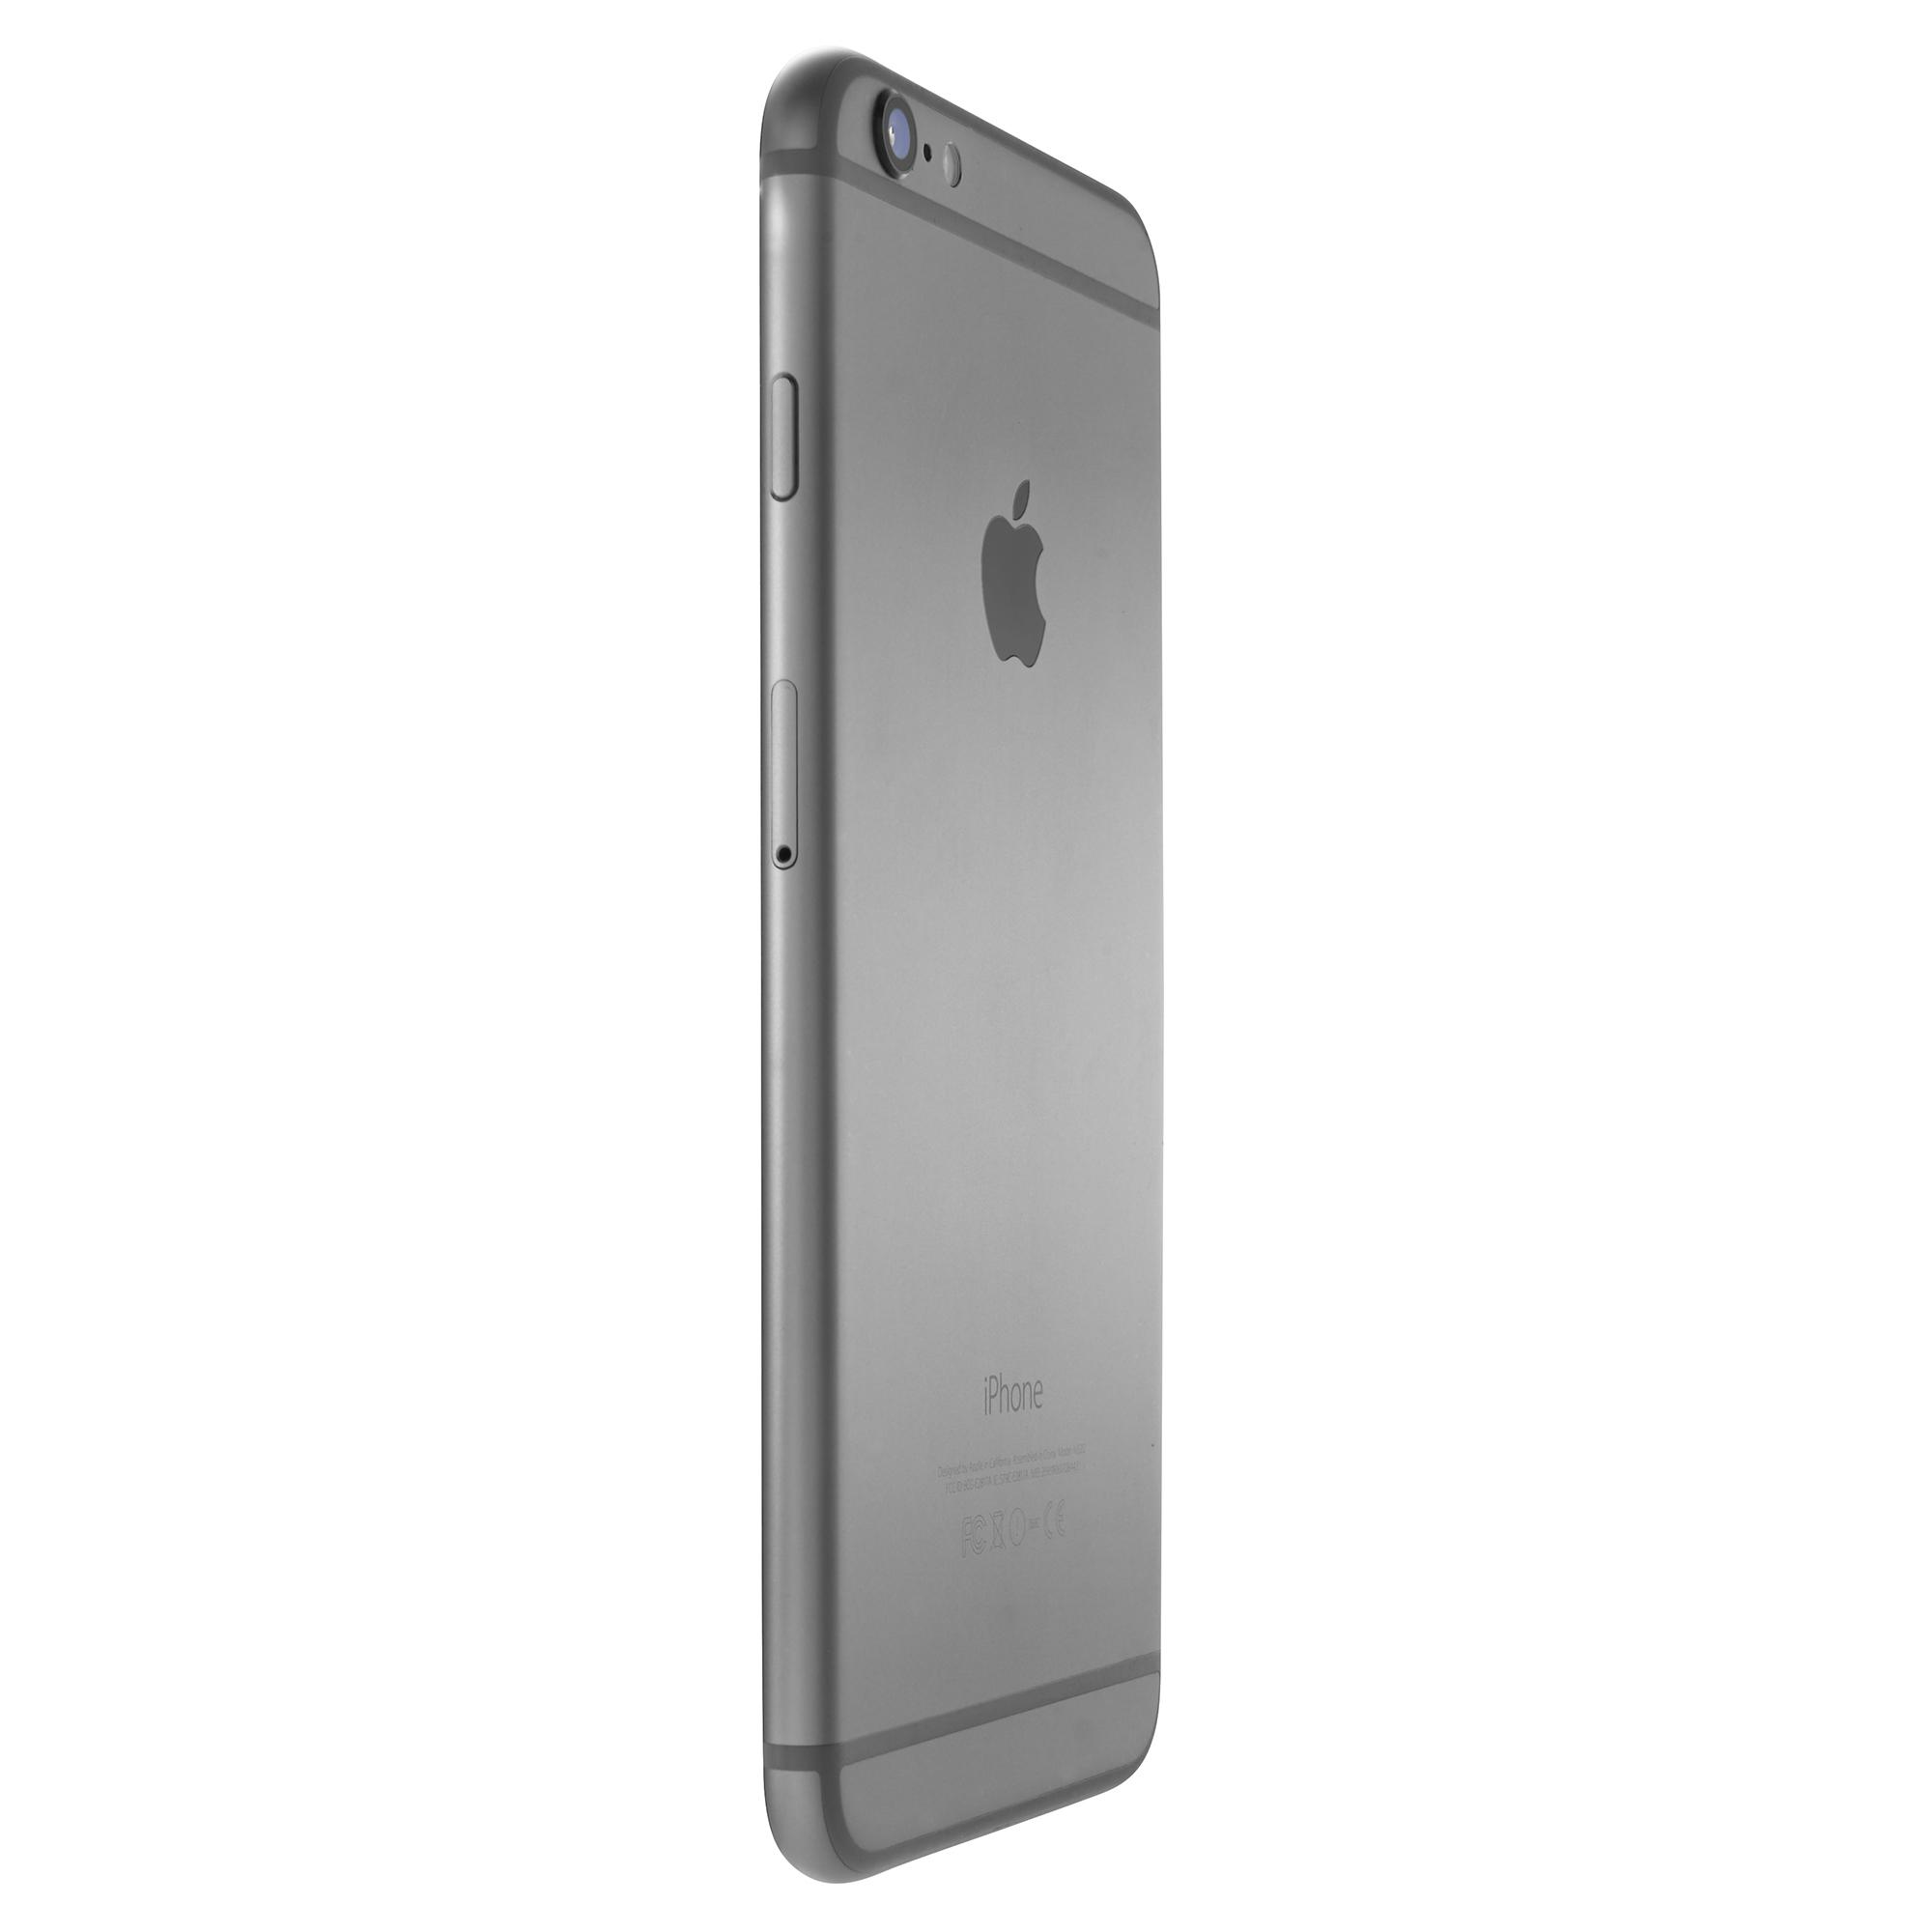 Apple-iPhone-6-Plus-a1522-16GB-LTE-CDMA-GSM-Unlocked-Very-Good thumbnail 7